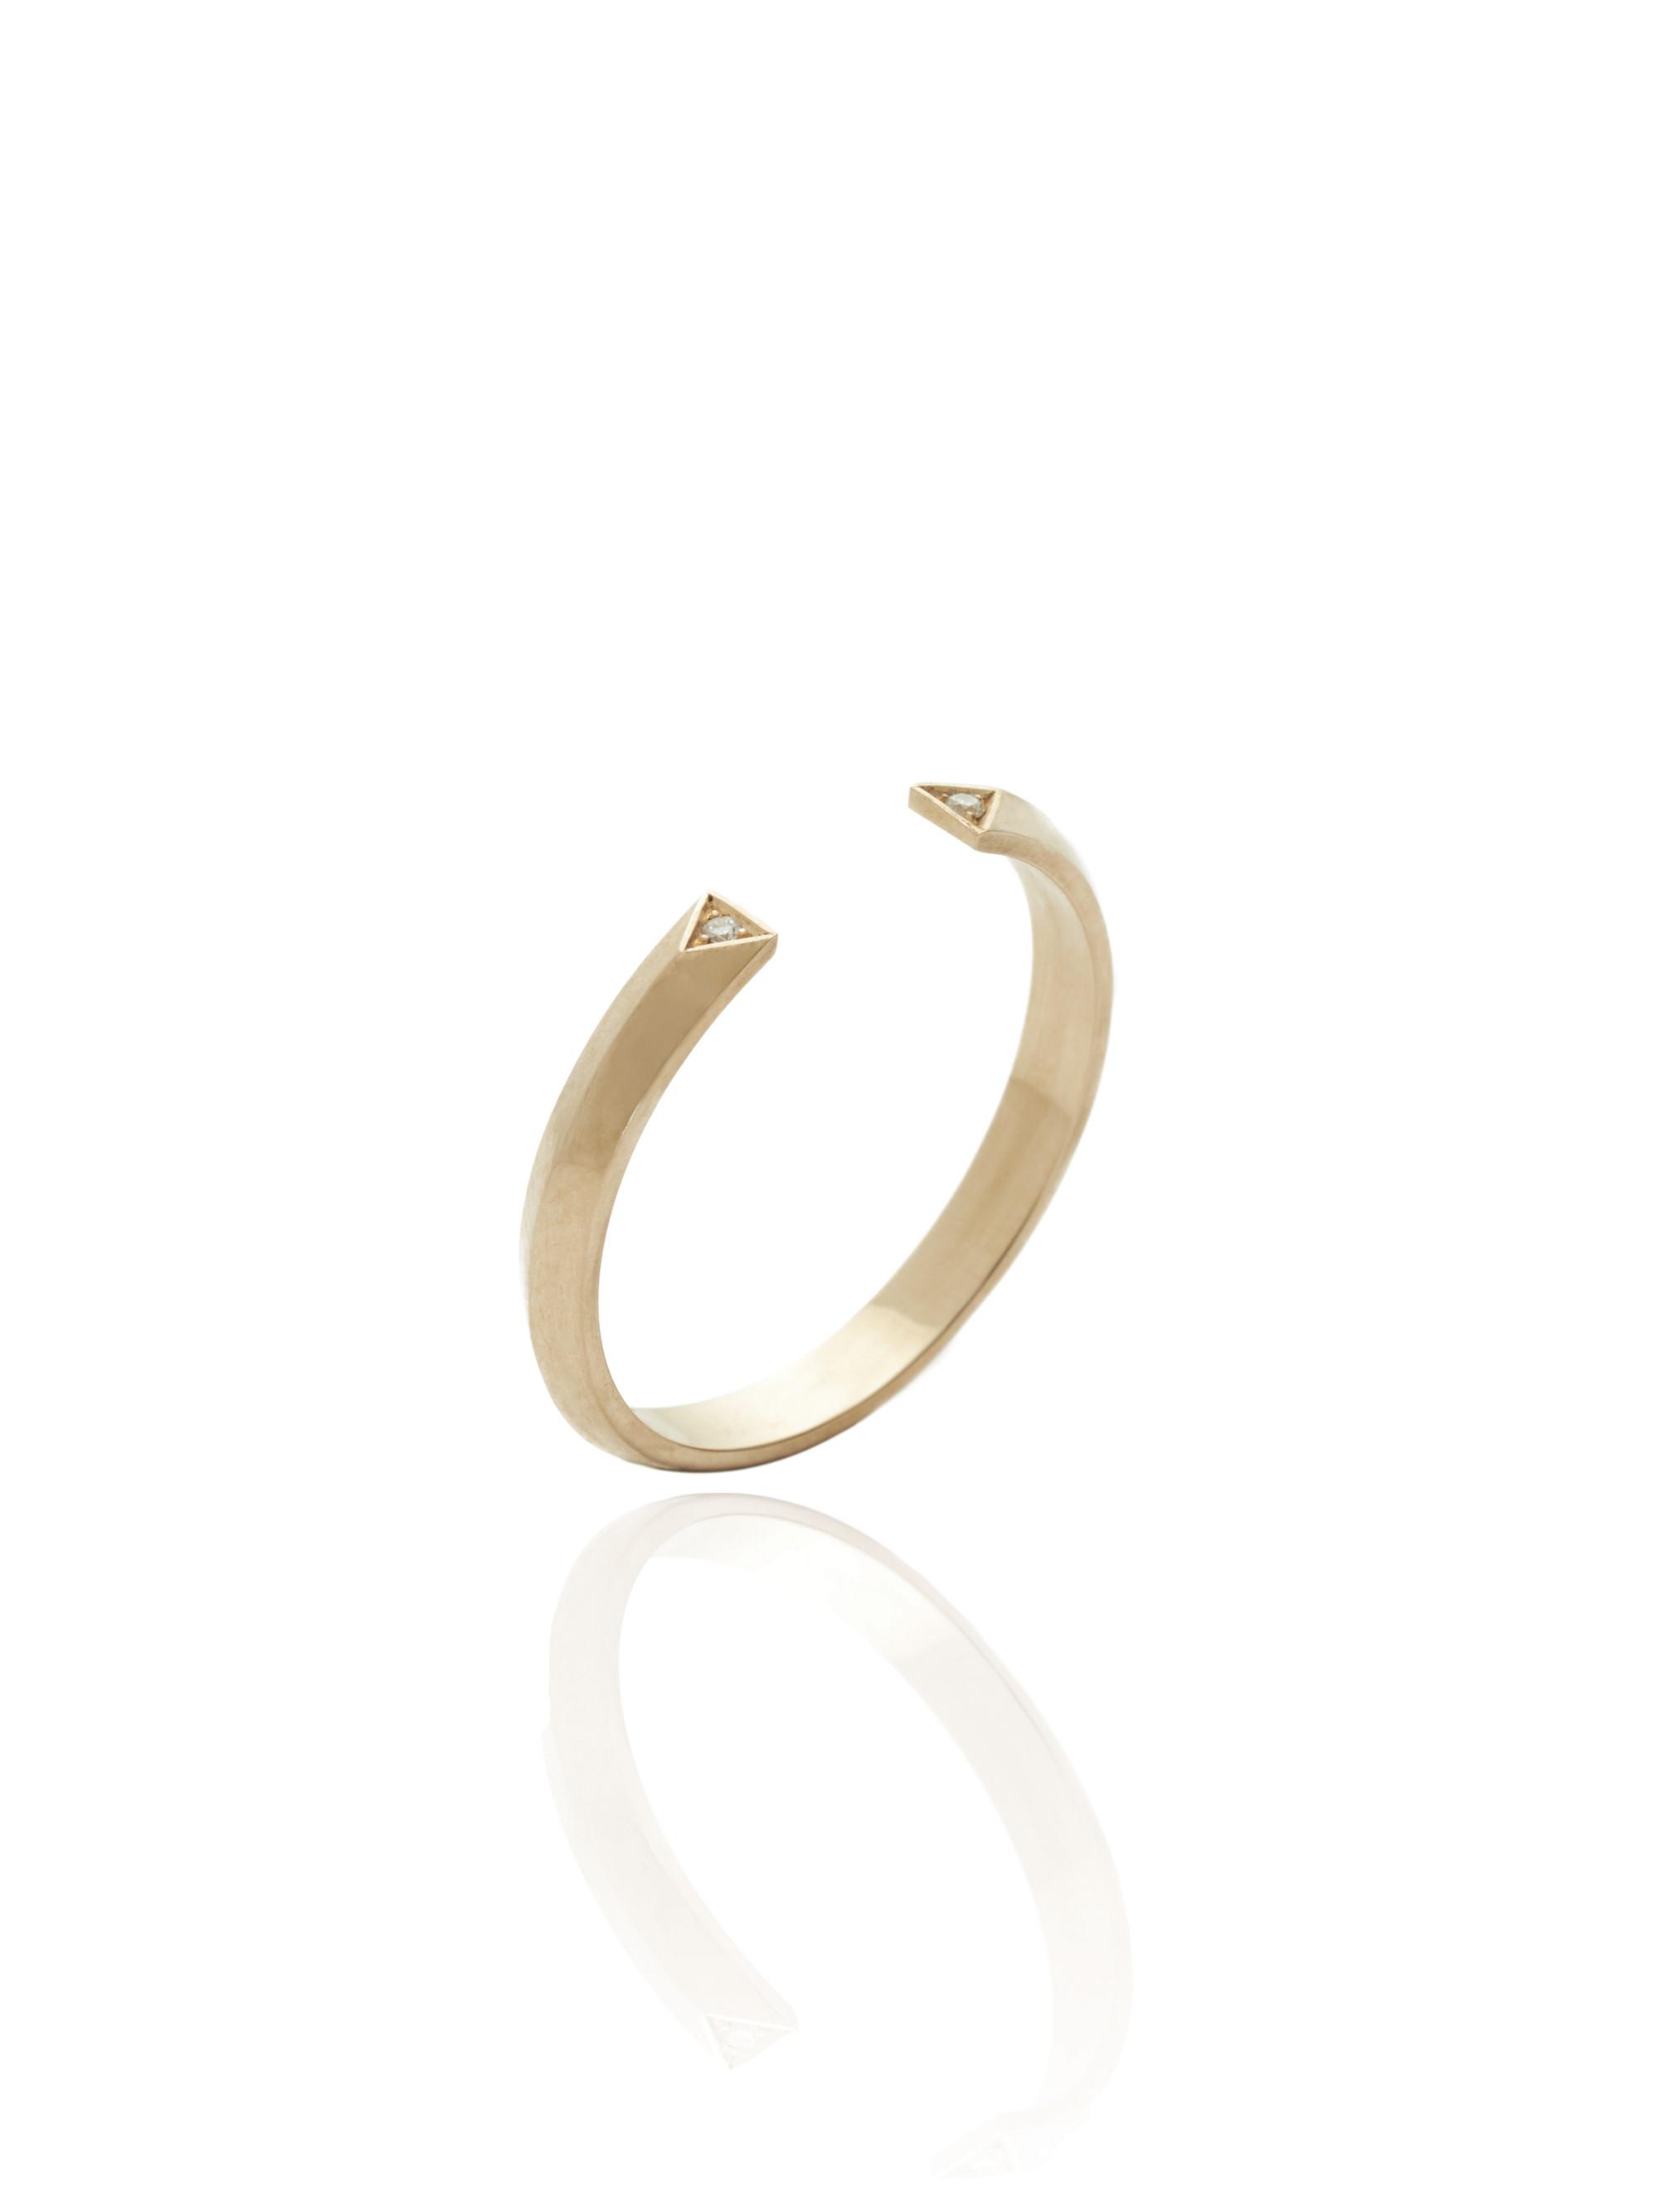 EMBRACE 9ct Gold & Diamond Ring